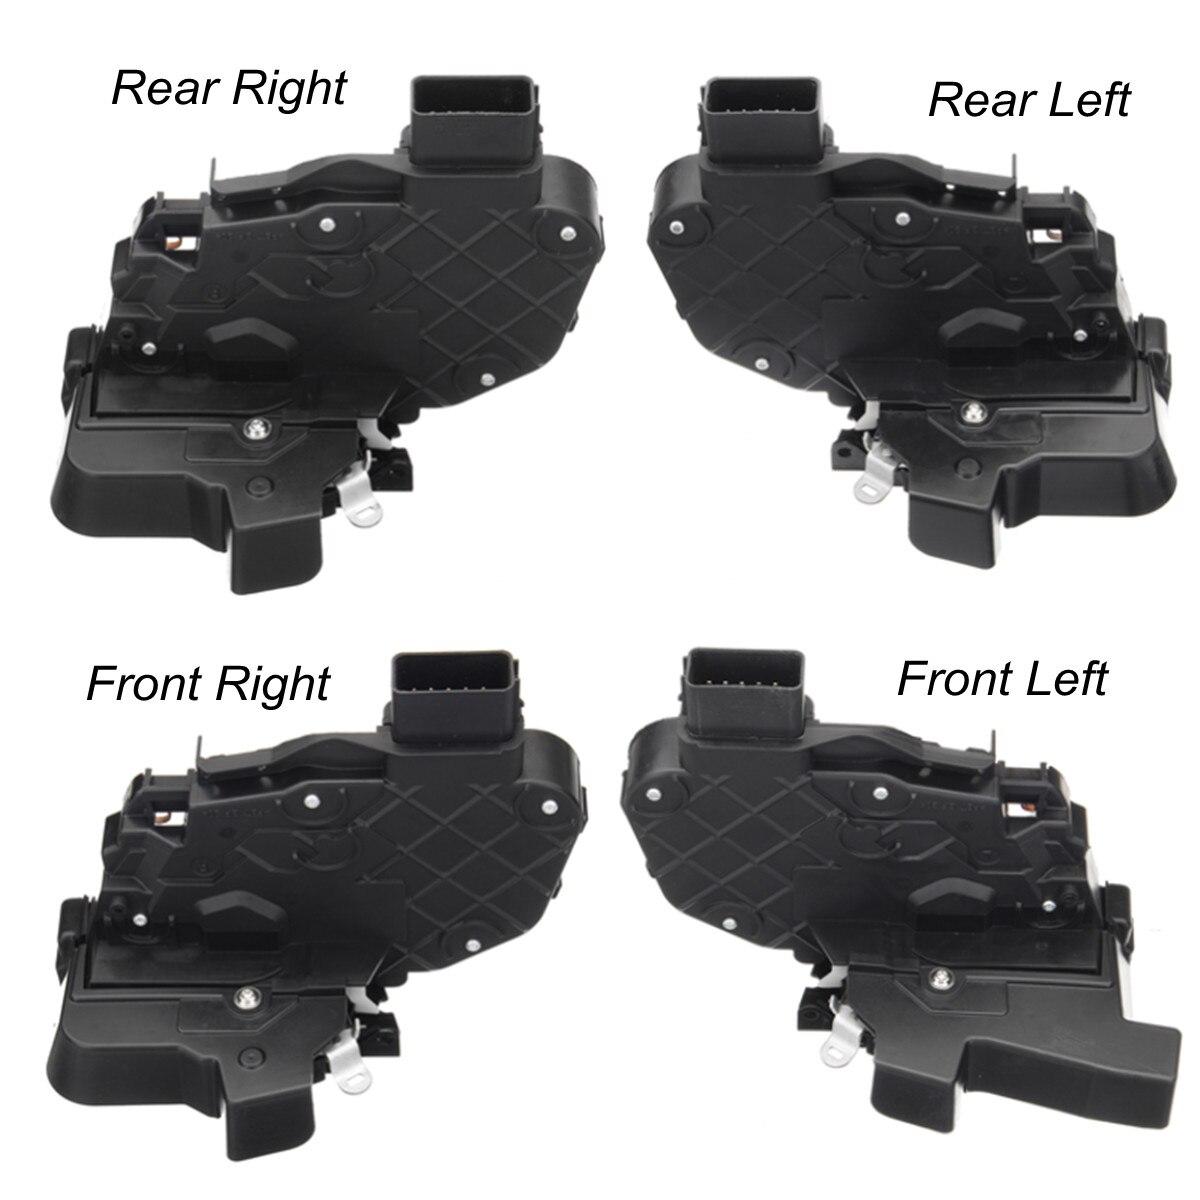 Car Door Lock Latch Mechanism Actuator For Land Rover Freelander Evoque Locks Hardware Aftermarket Front/Rear Left/Right